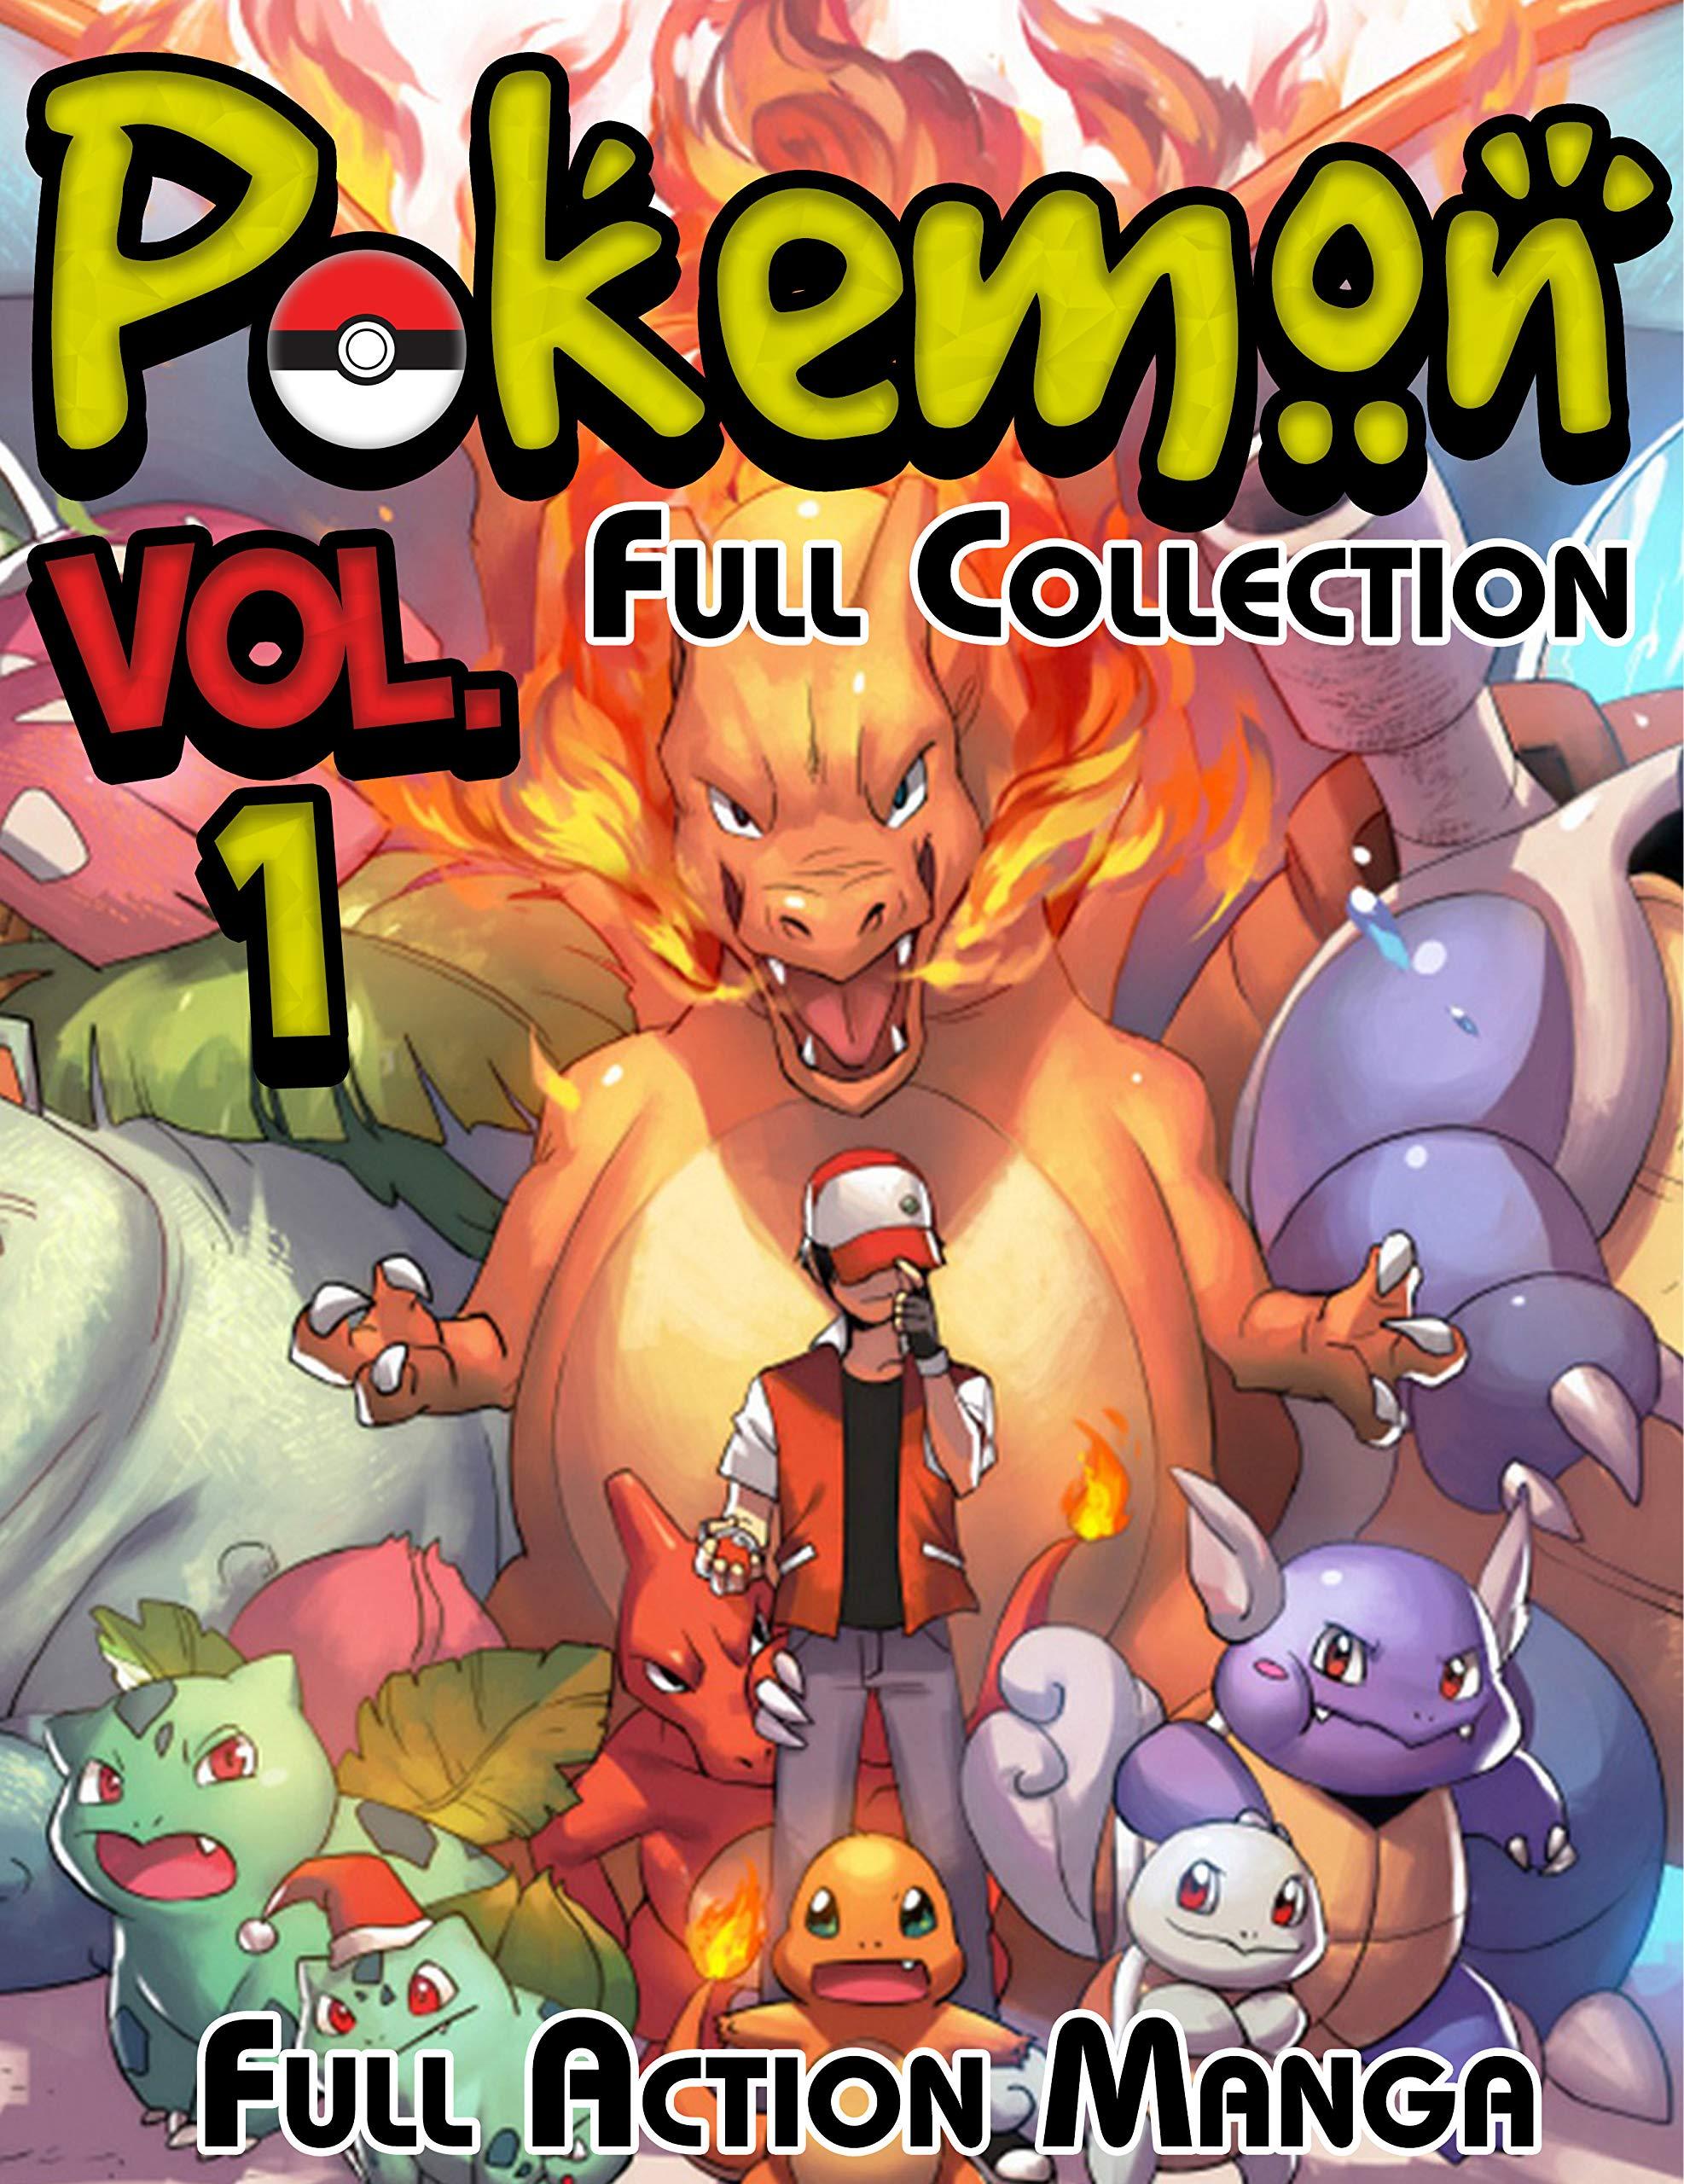 Full Action Manga Pokemon Full Collection: Limited Edition Pokemon Vol 1